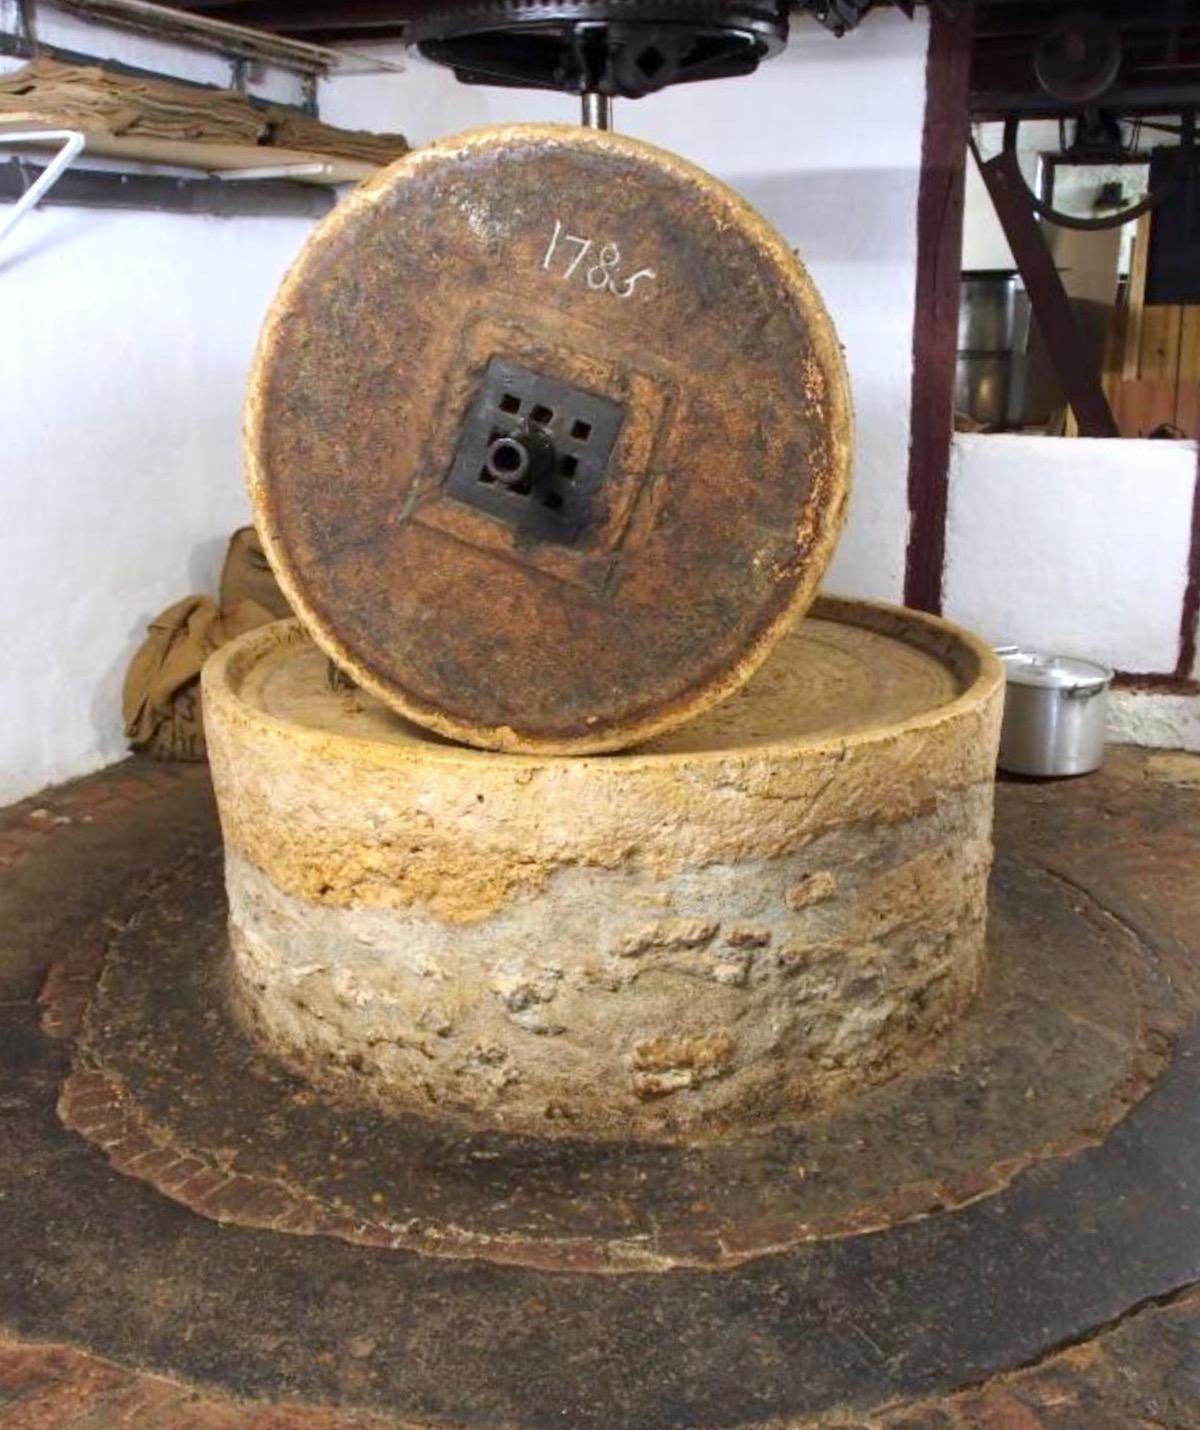 Meule de pierre - Huilerie d'Amboise